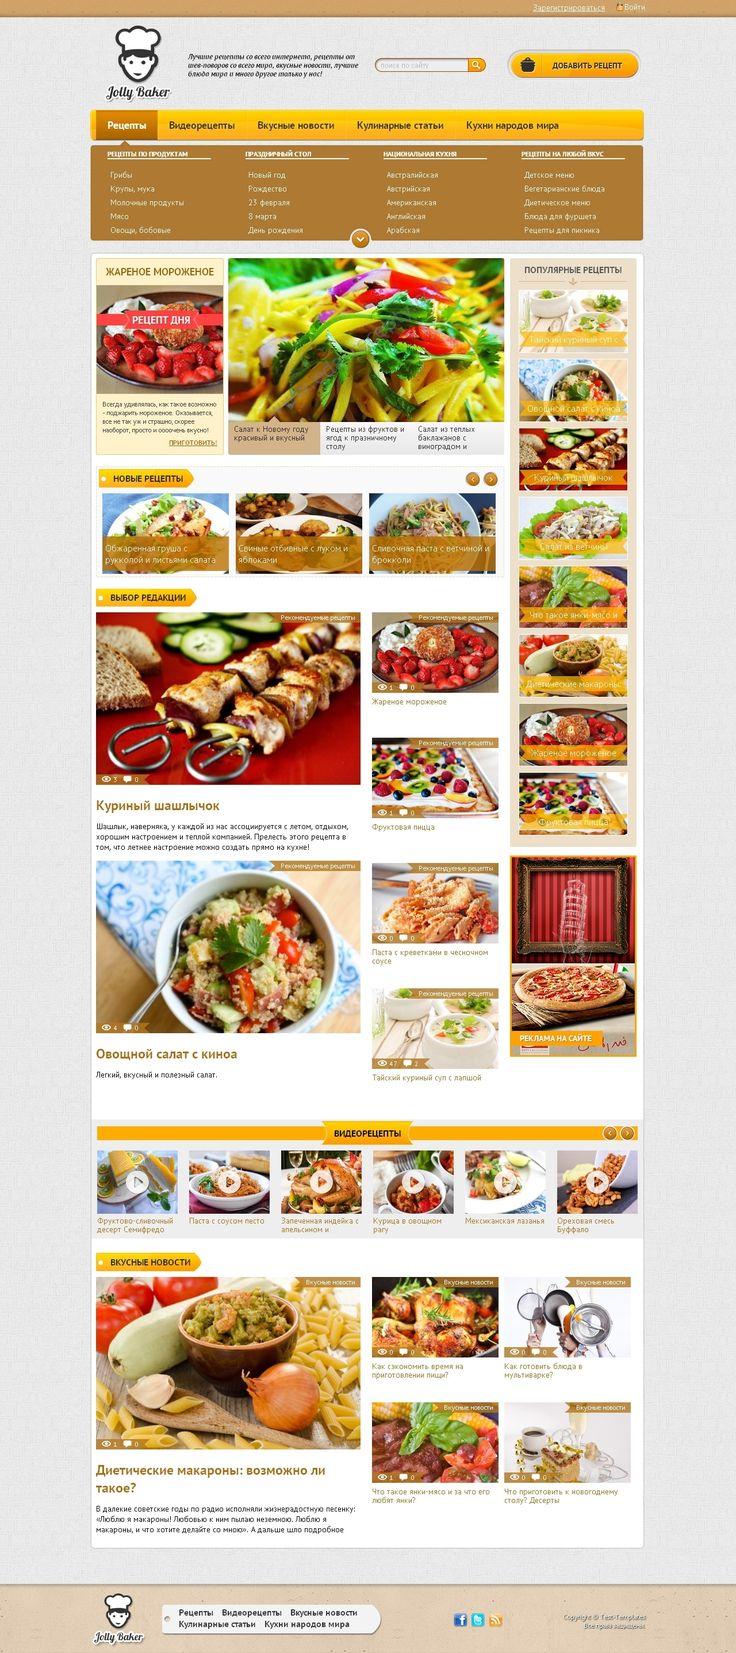 Jolly Baker для DLE #templates #website #шаблон #сайт #web